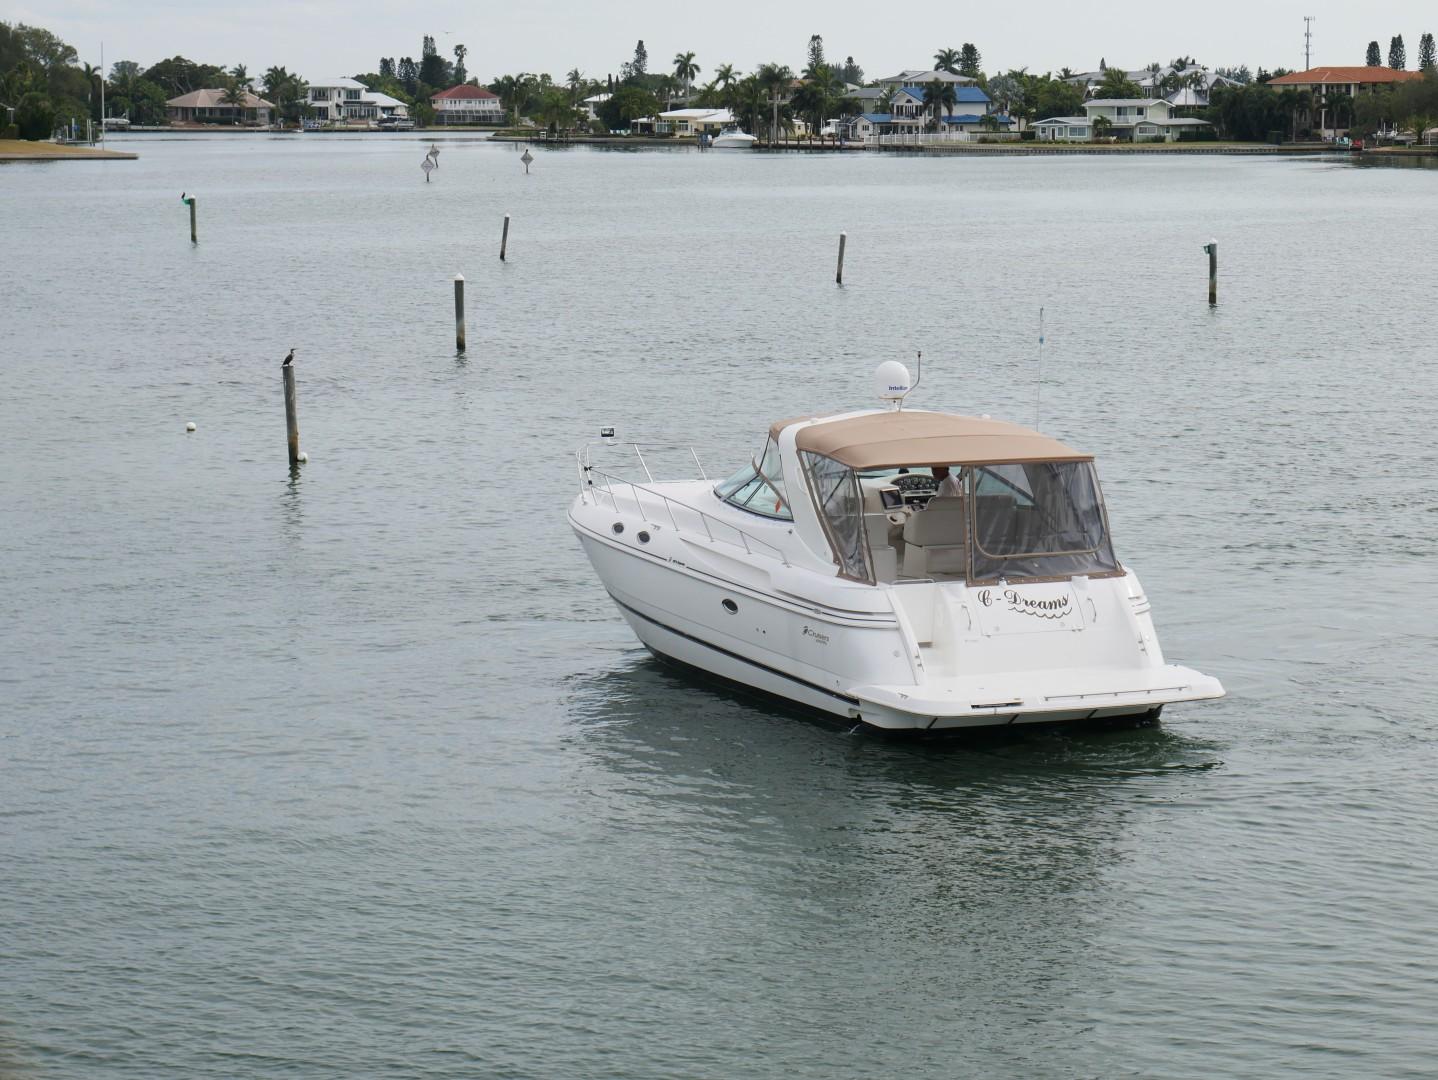 Cruisers-3870 Express 2000-CDreams Destin-Florida-United States-2000 38 Cruisers CDreams Transom-1420235 | Thumbnail